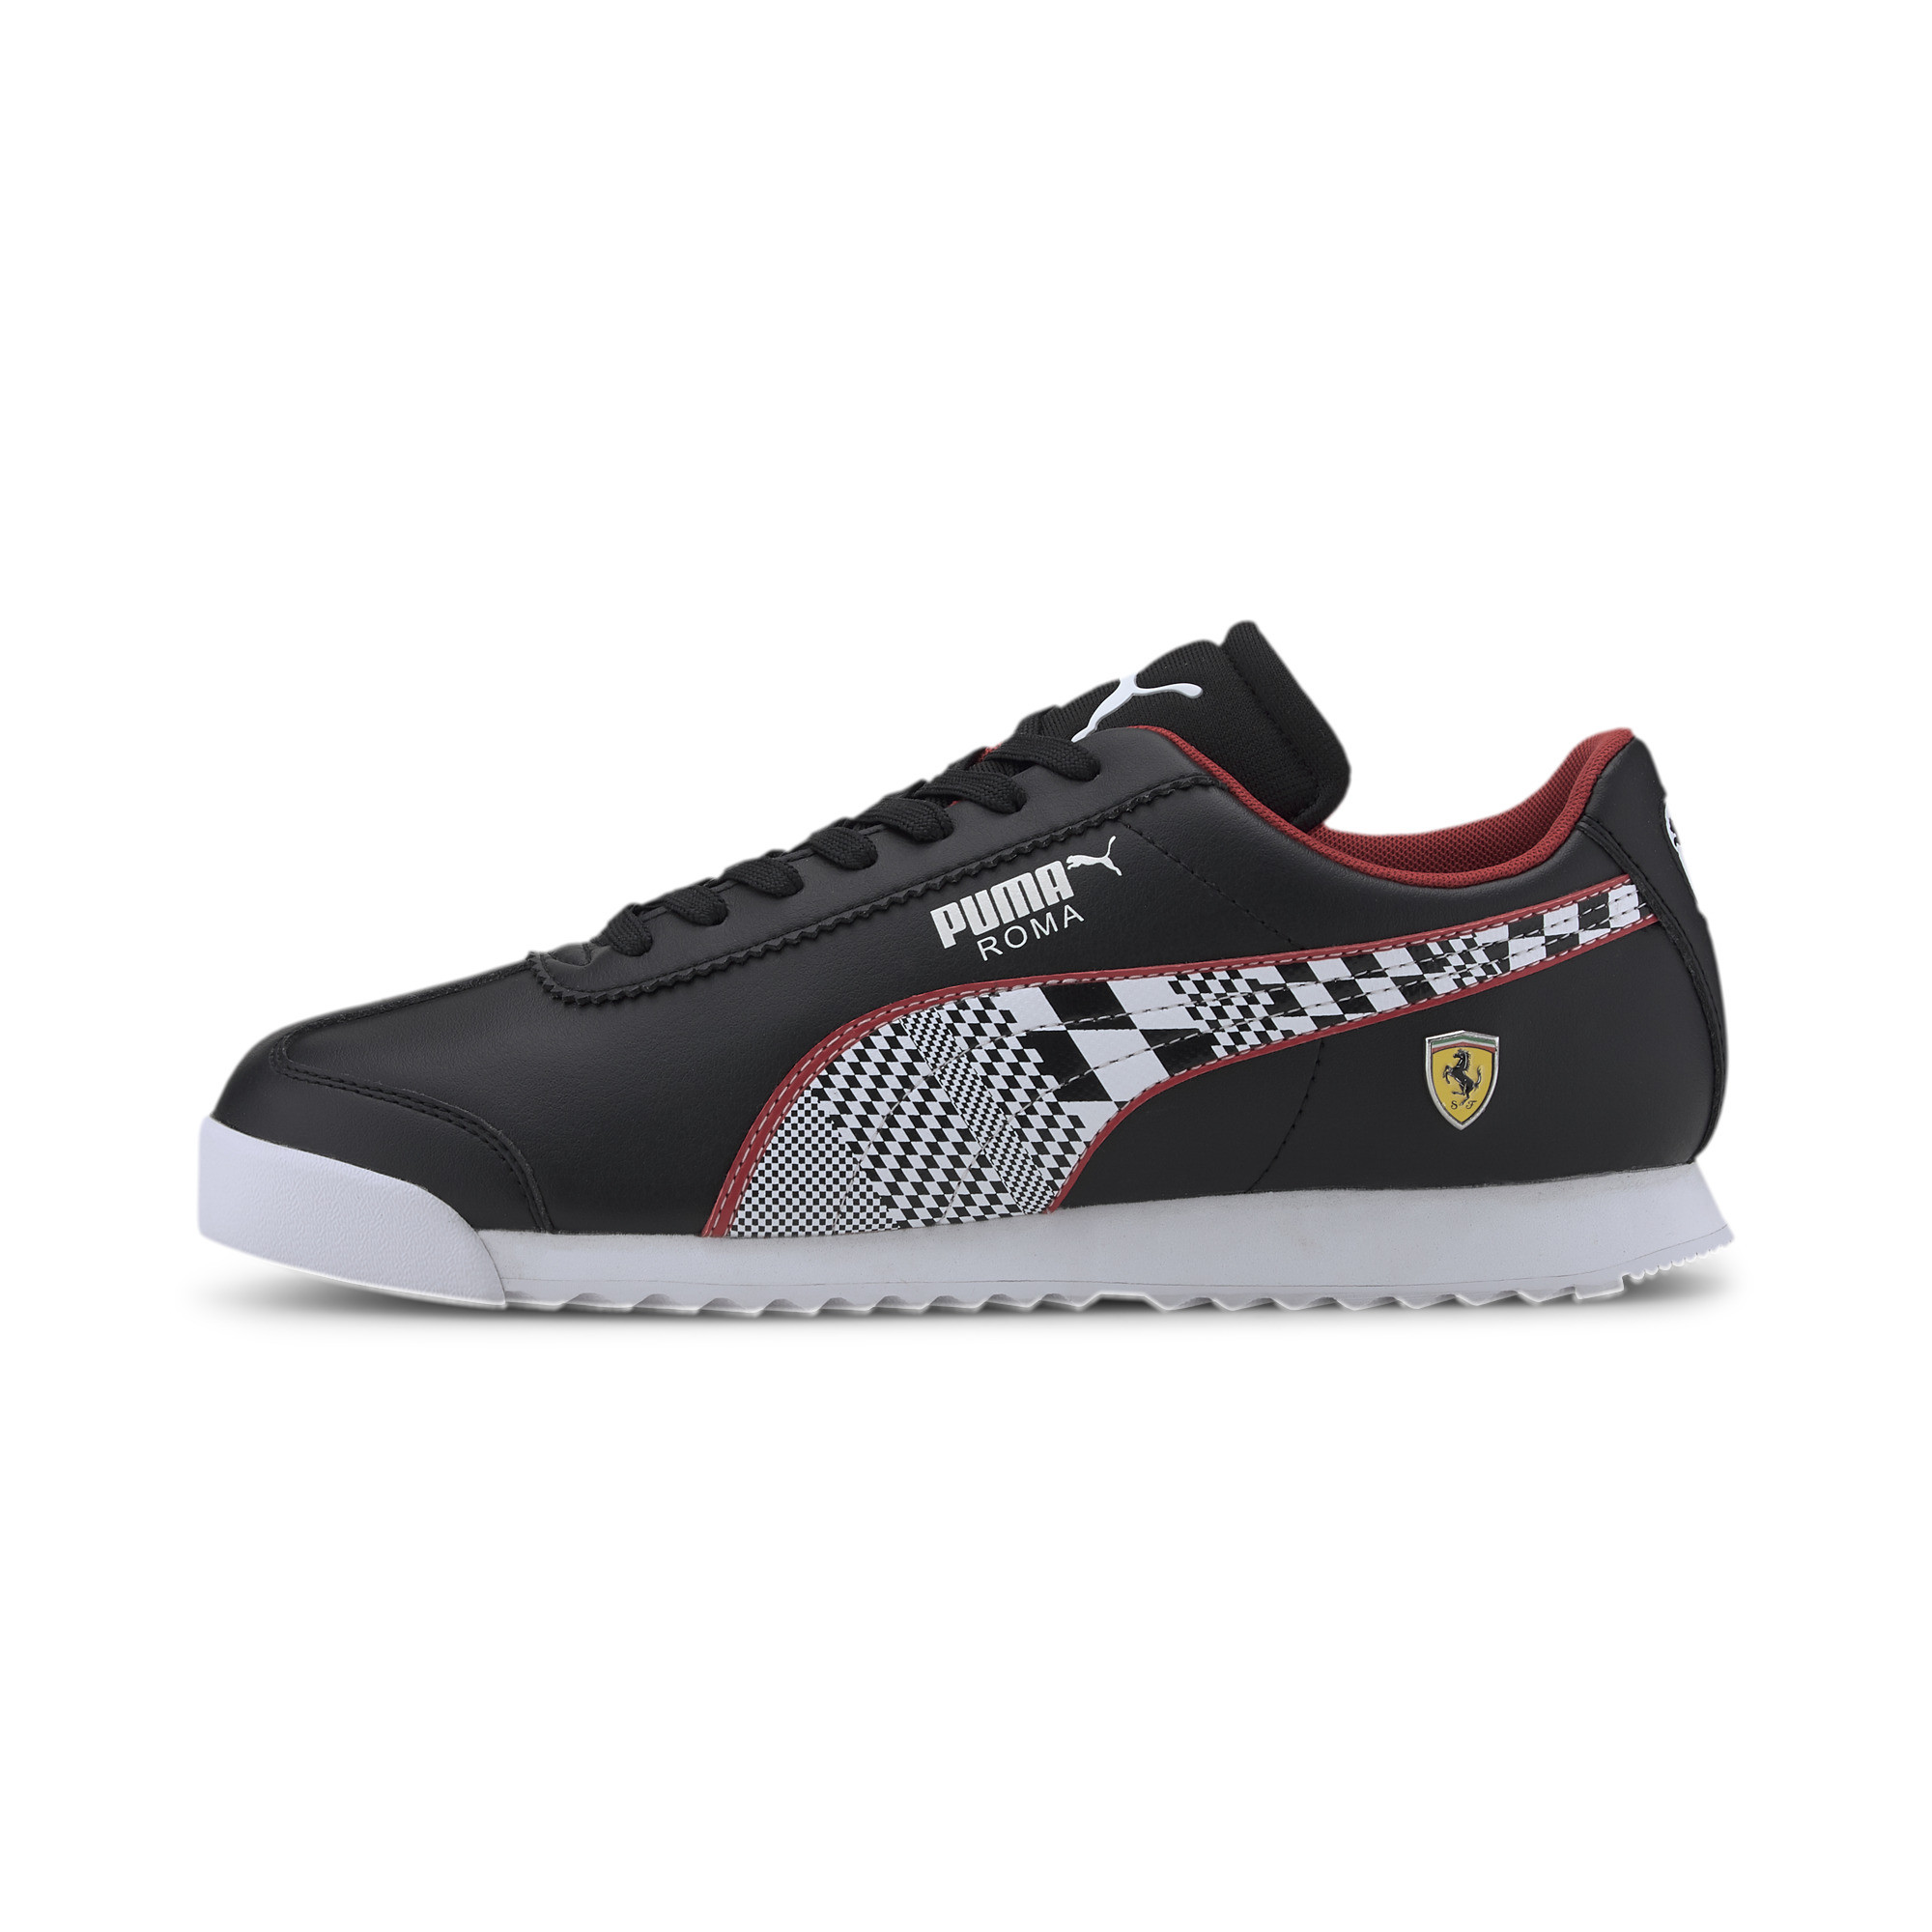 PUMA-Men-039-s-Scuderia-Ferrari-Roma-Sneakers thumbnail 4